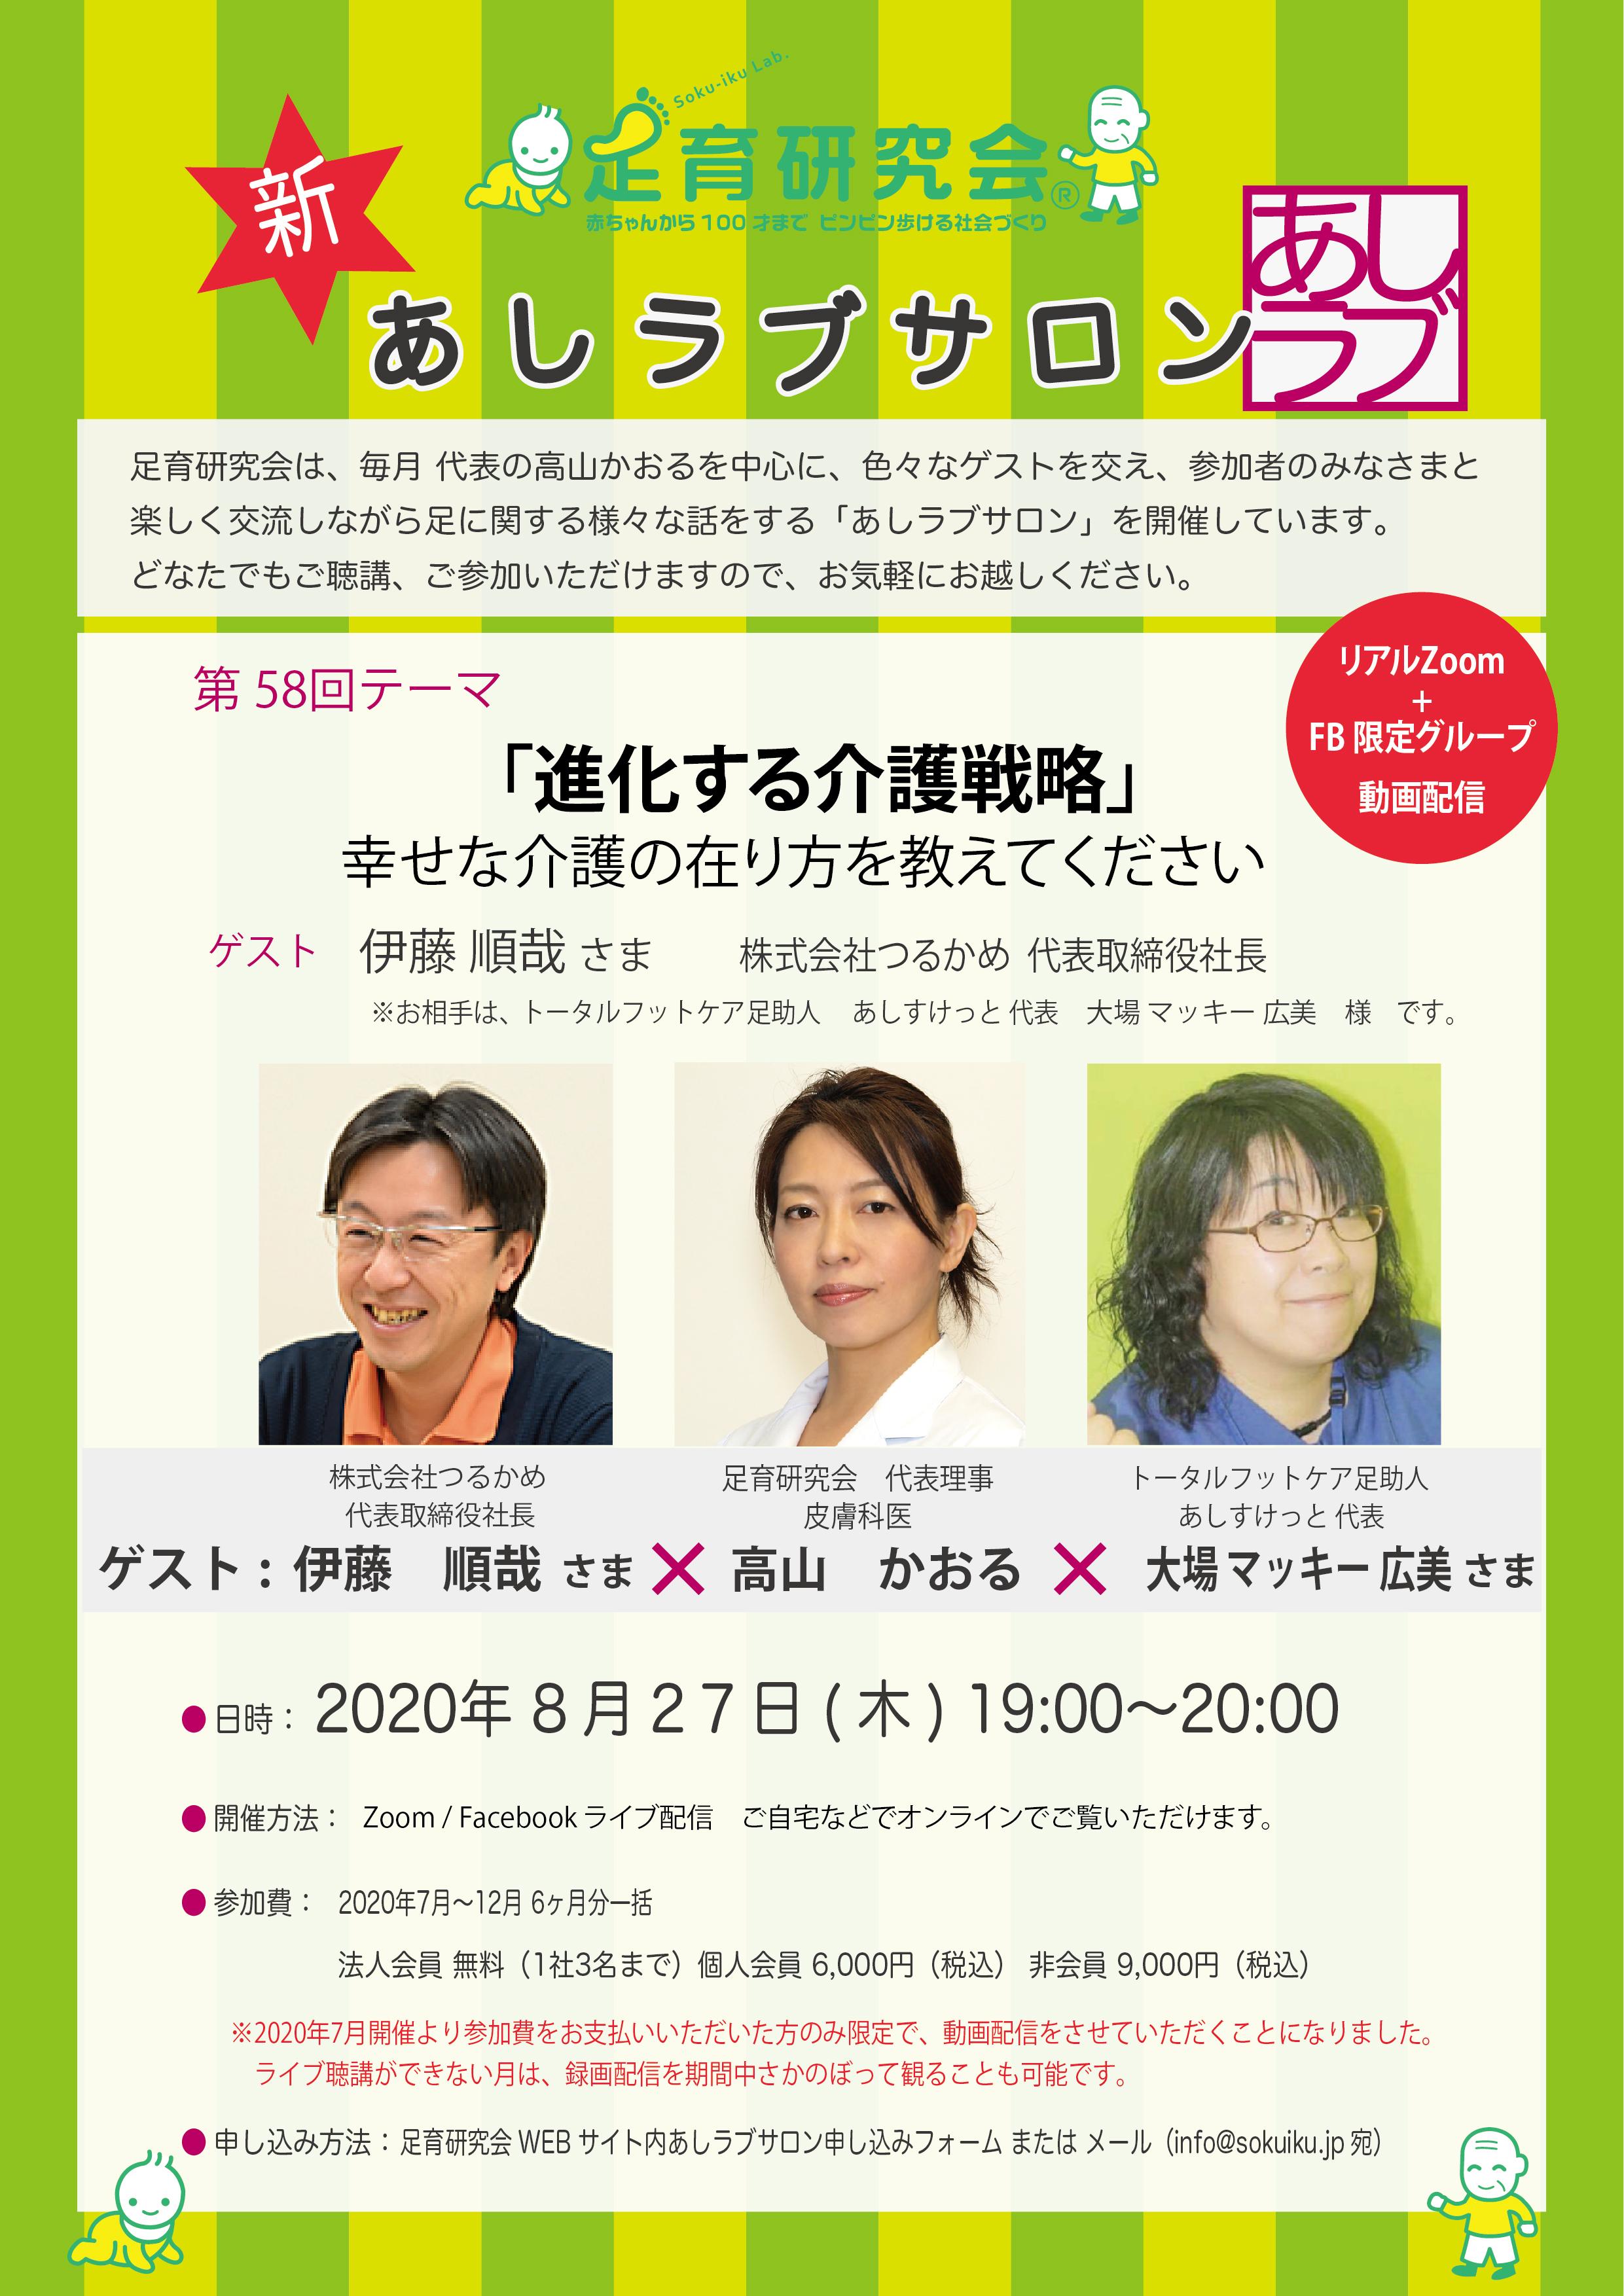 https://www.sokuiku.jp/photo/ashilove20200824.jpg